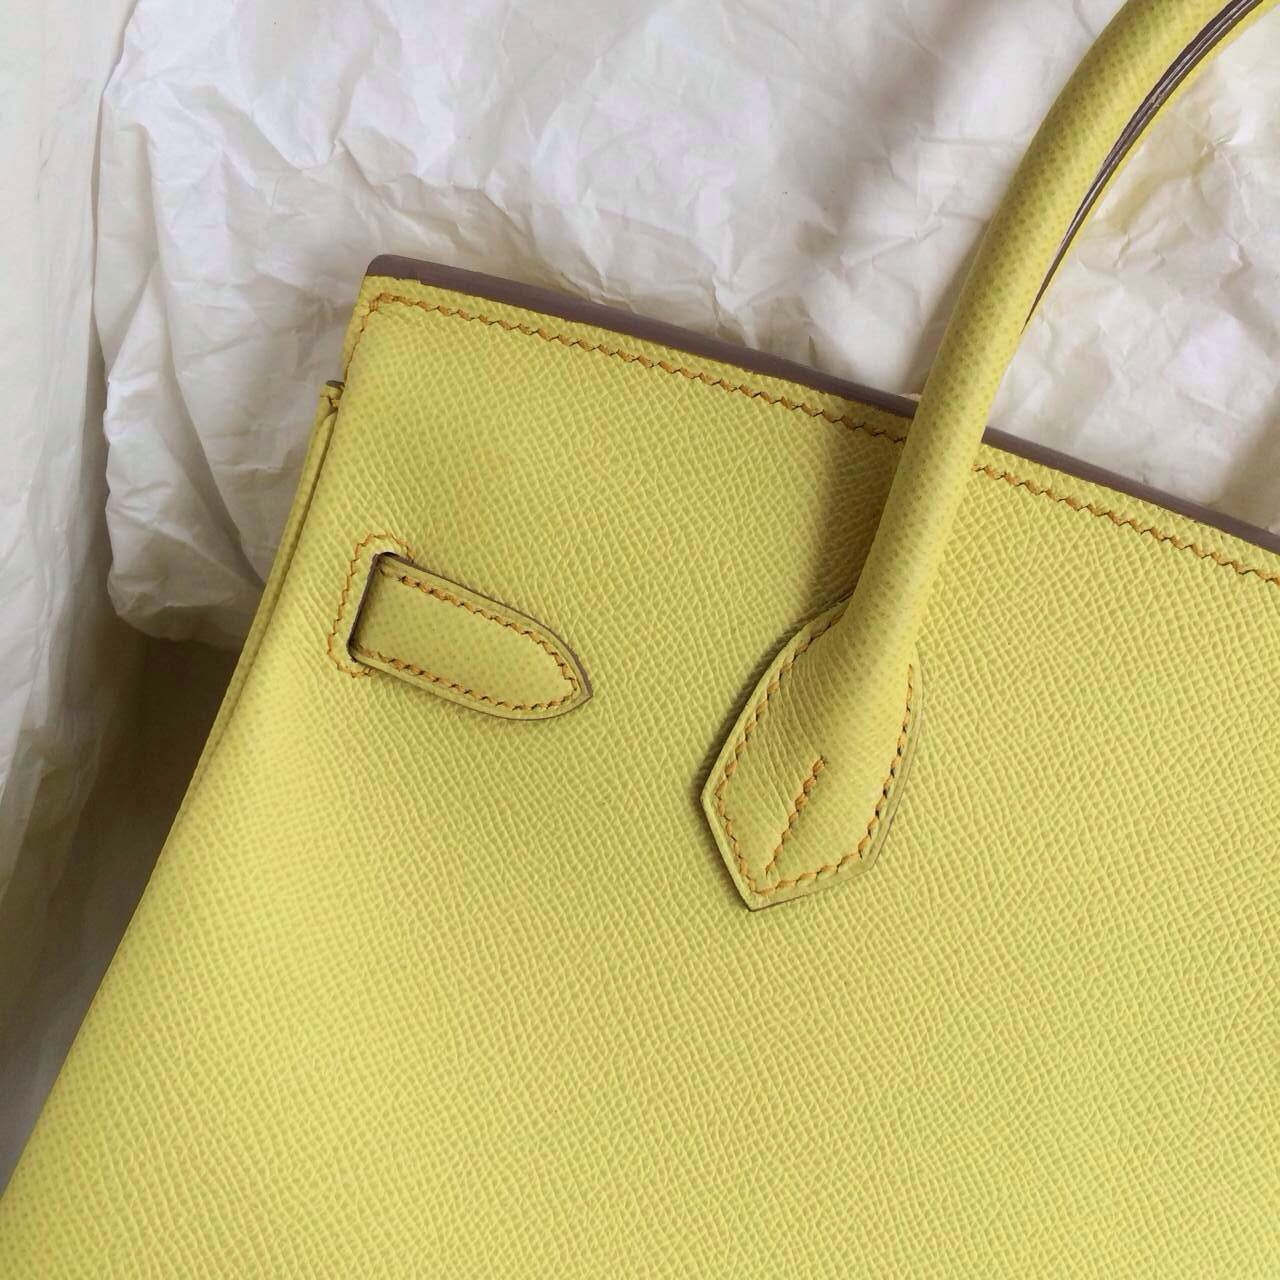 Hermes Birkin handbags 35cm gold hardware